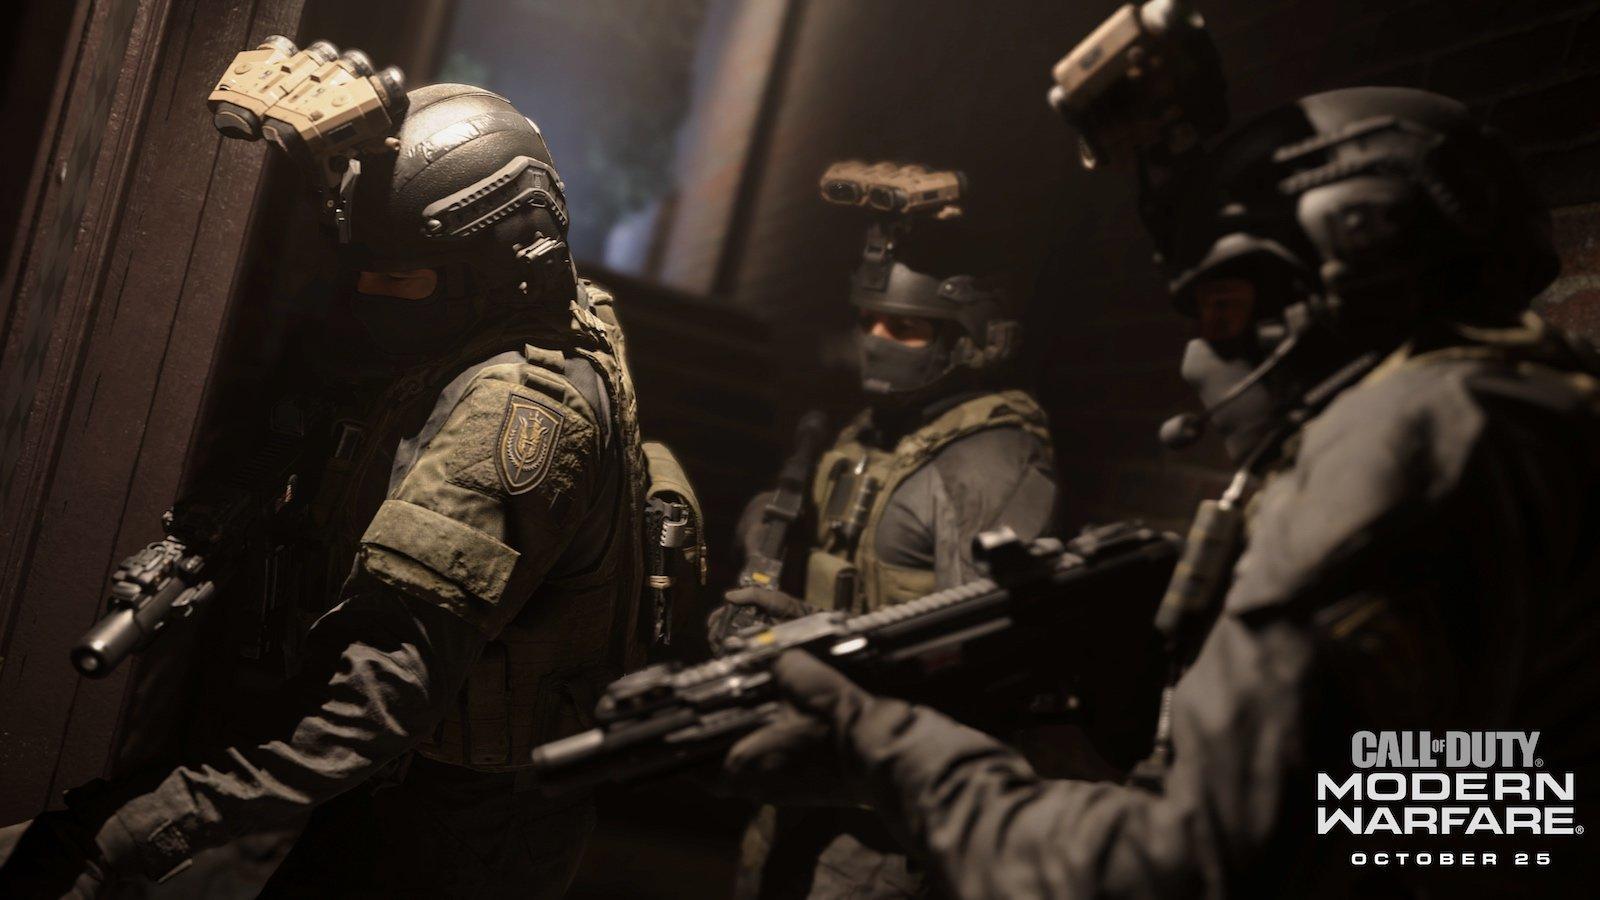 Call of Duty: Modern Warfare screen